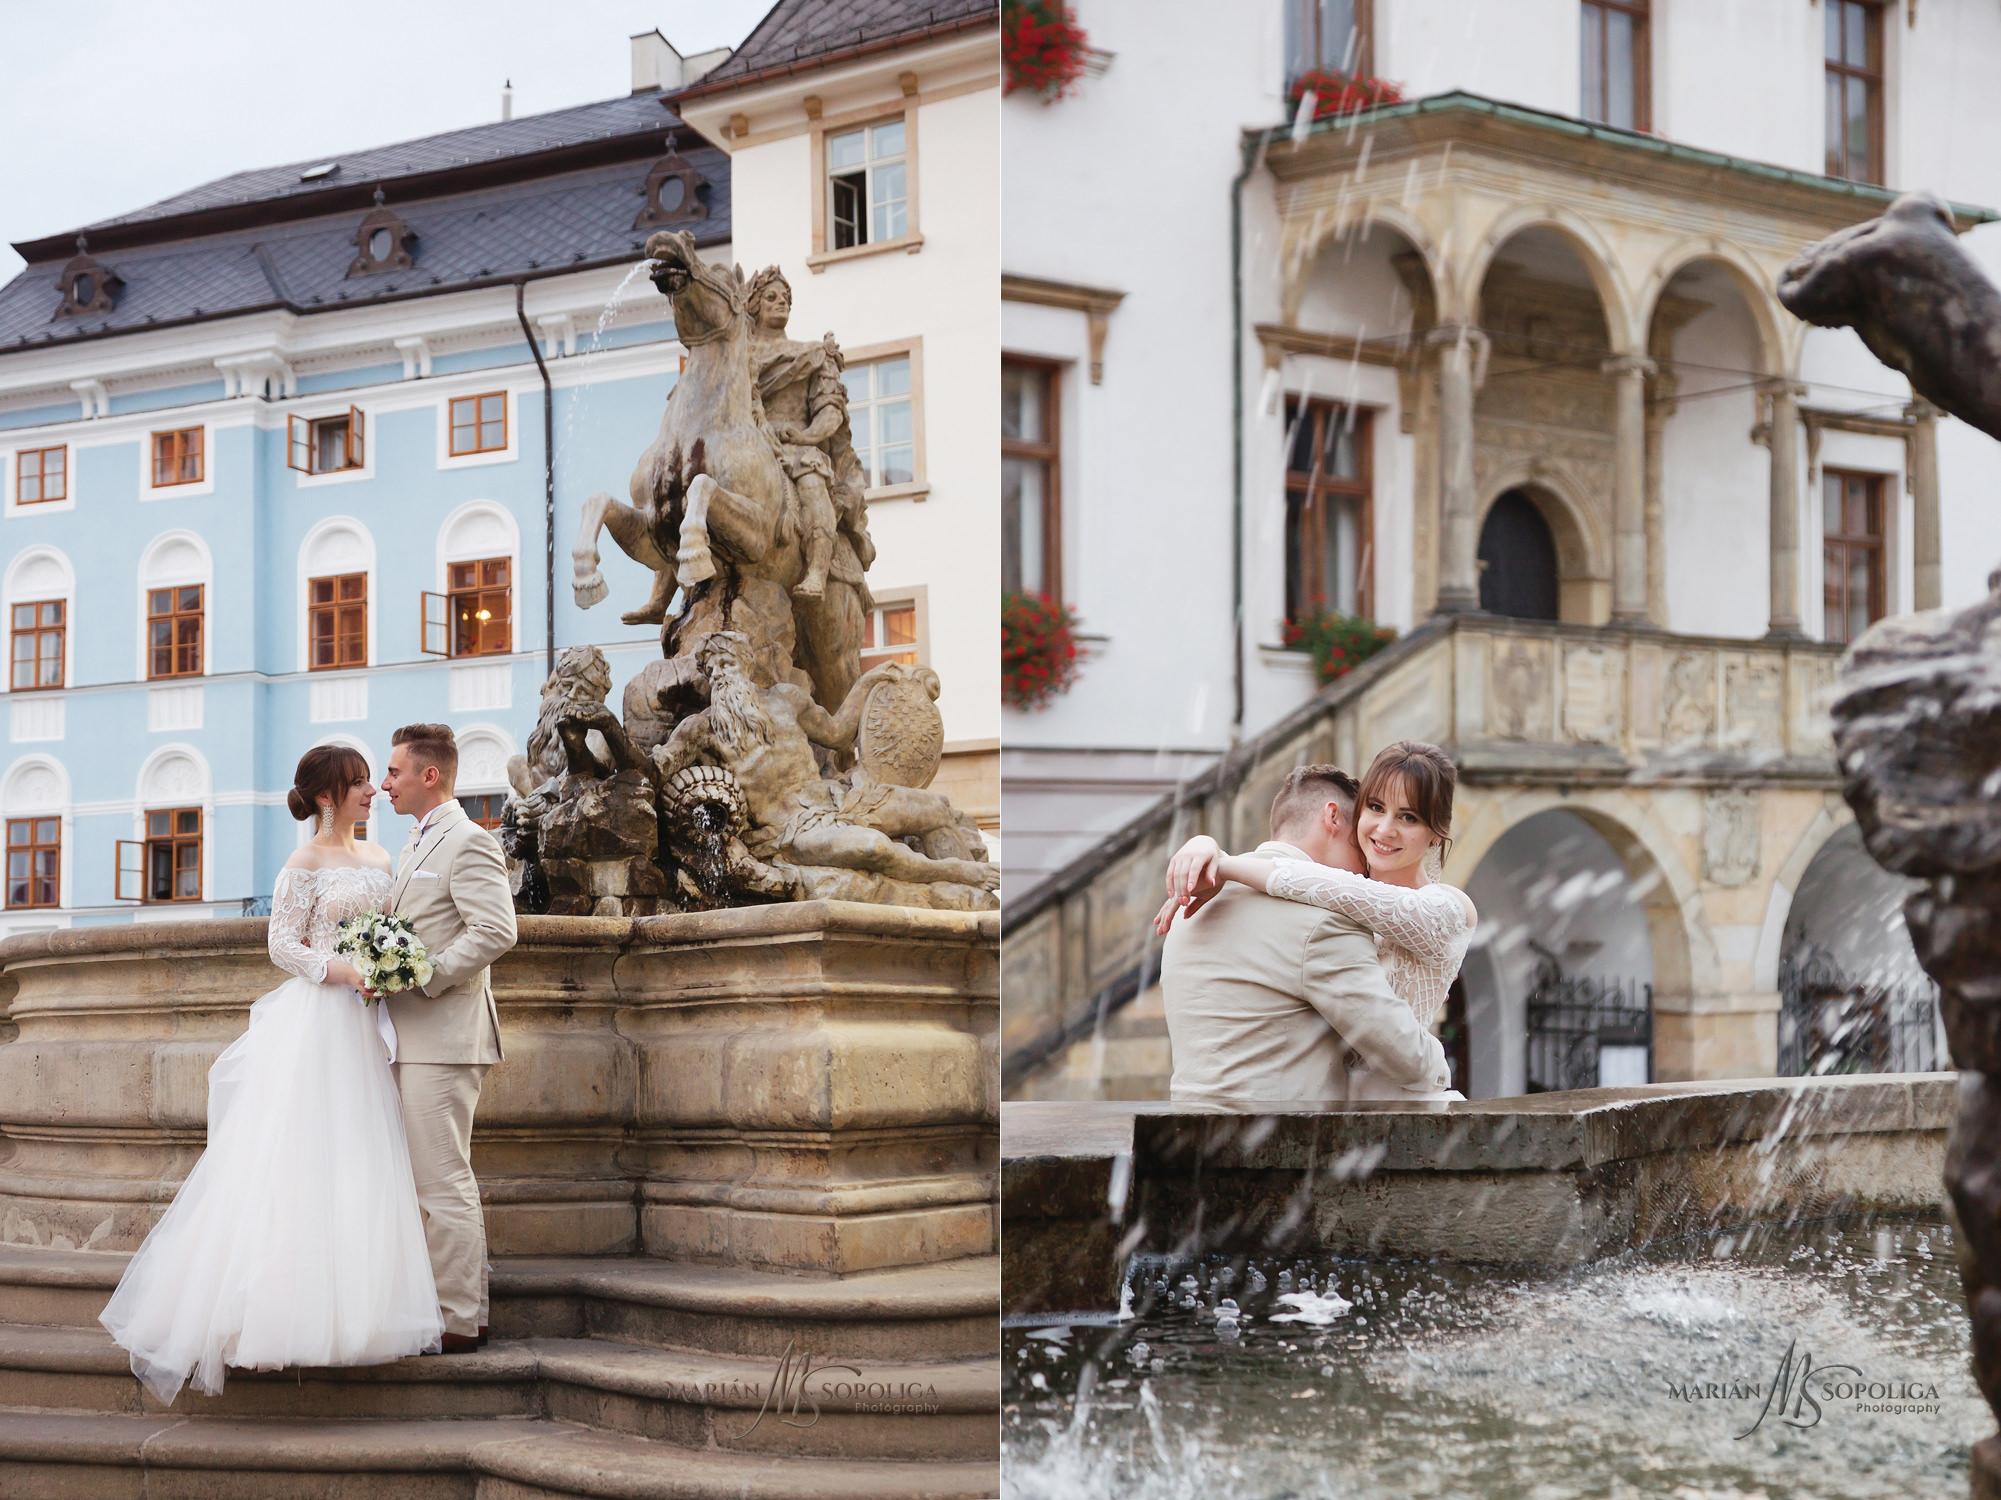 66portretni-svatebni-foto-zenicha-a-nevesty-u-caesarovy-kasny-v-